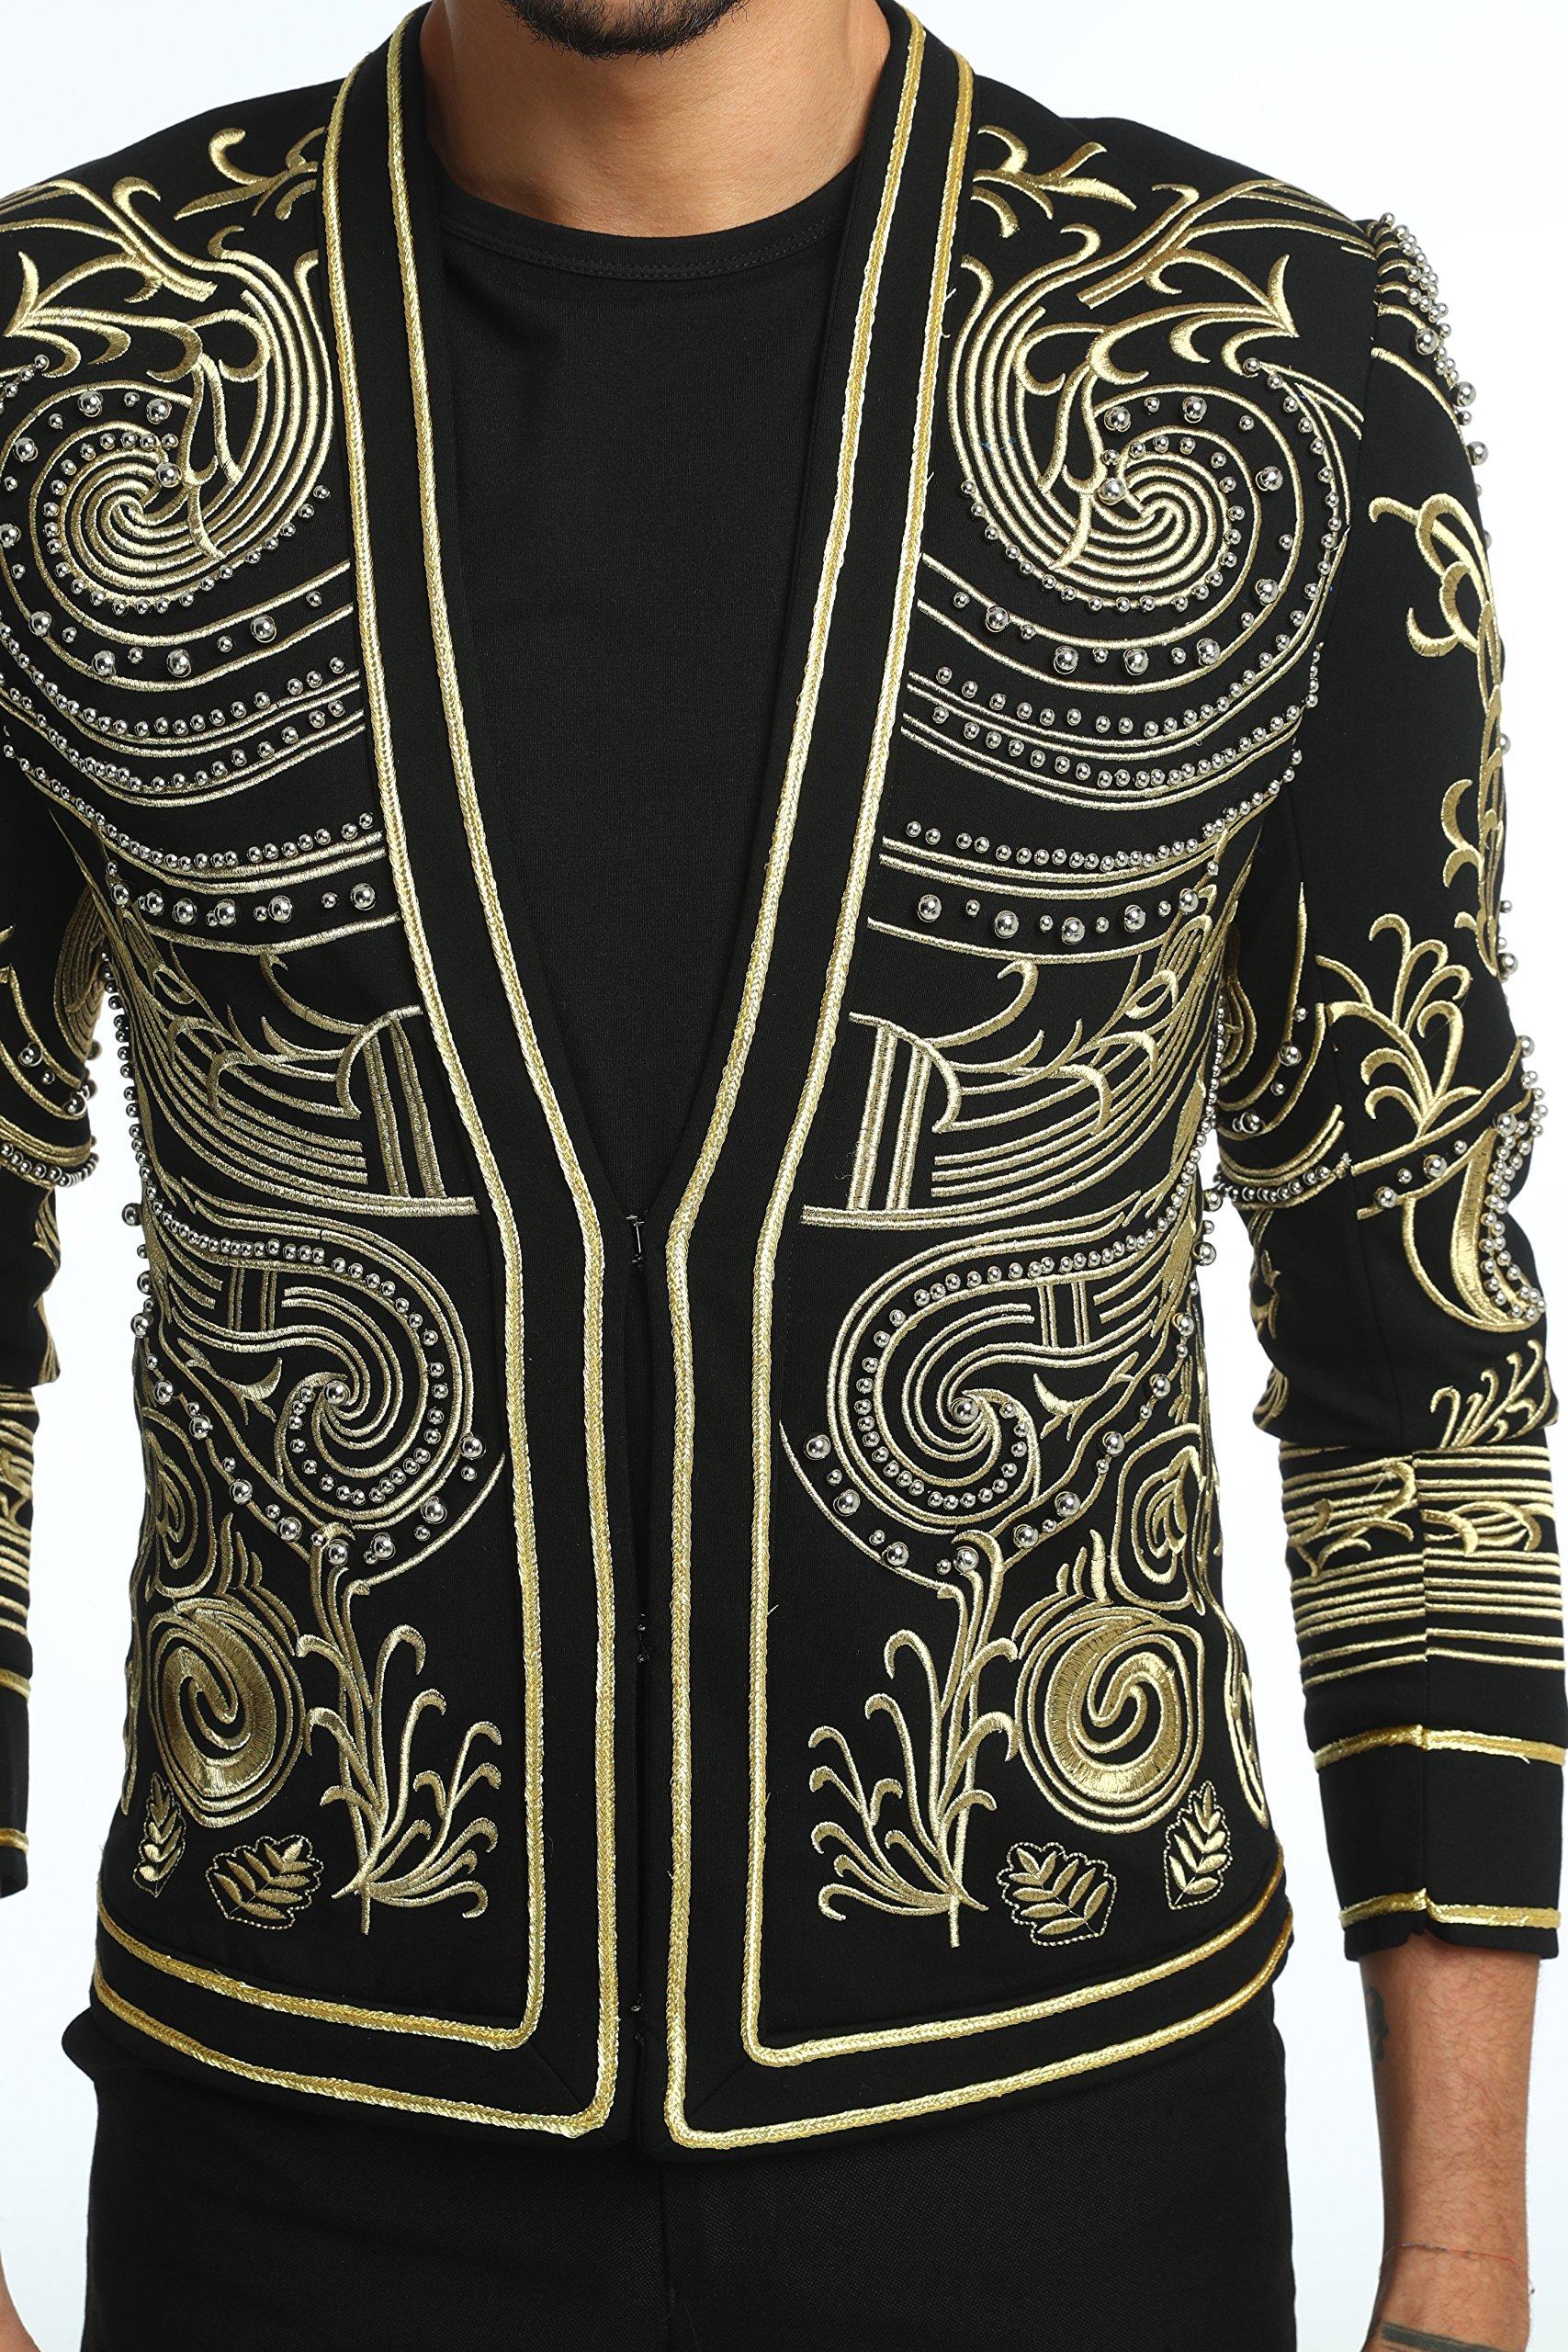 Pizoff Men's Luxury V-Neck Slim Fit Stylish Suit Blazer Jacket Long Sleeve Formal Dinner Dress AD001-02-L by Pizoff (Image #5)